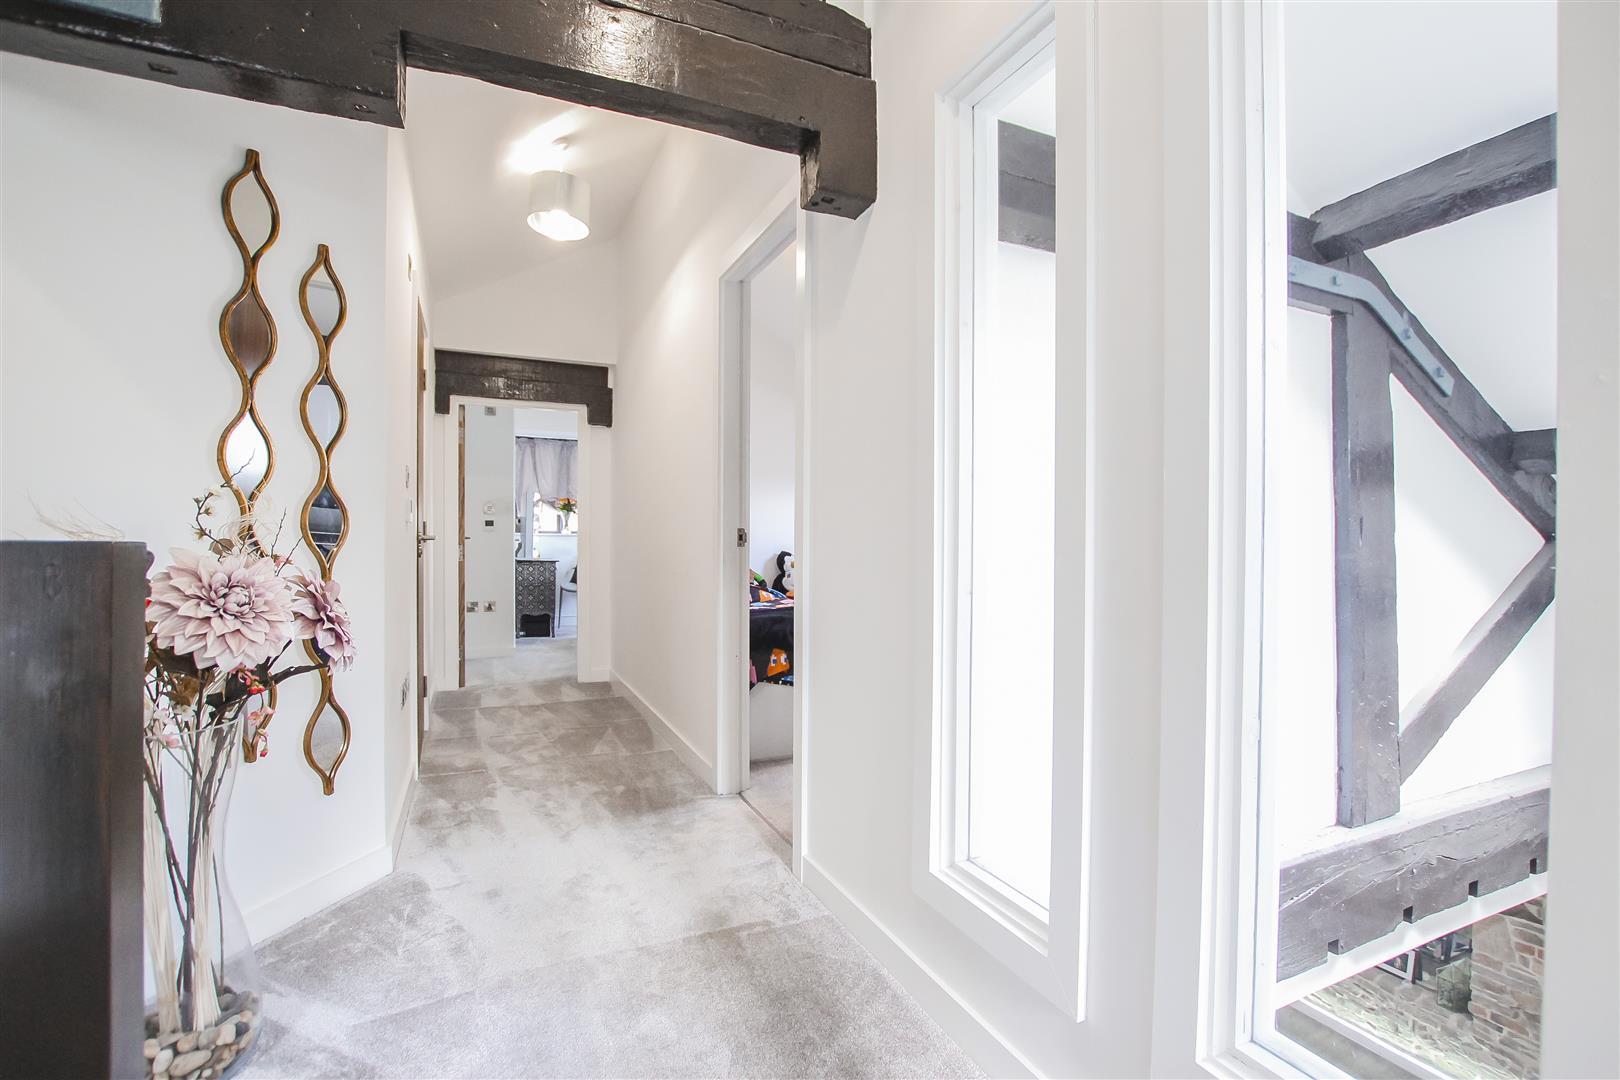 3 Bedroom Duplex Apartment For Sale - Image 35